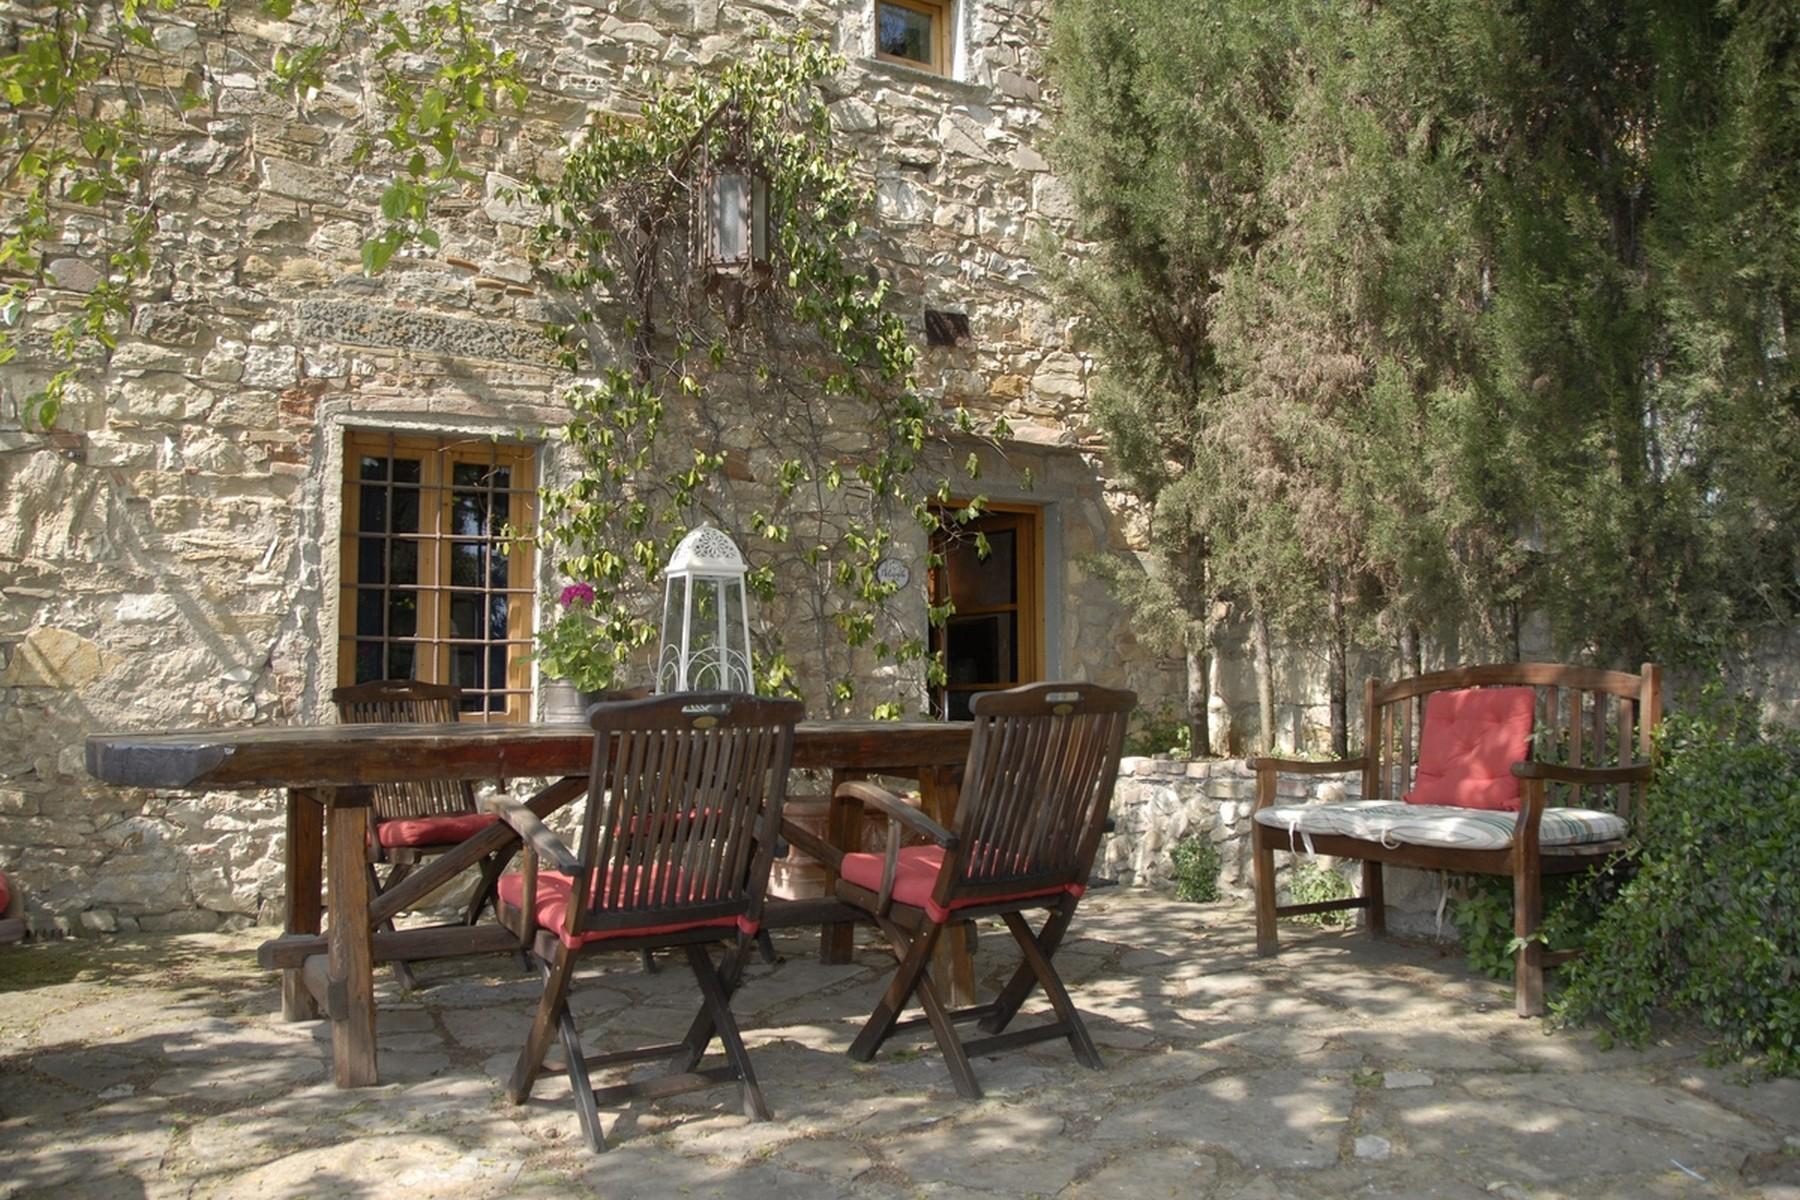 Villa in Vendita a Greve In Chianti: 5 locali, 400 mq - Foto 5